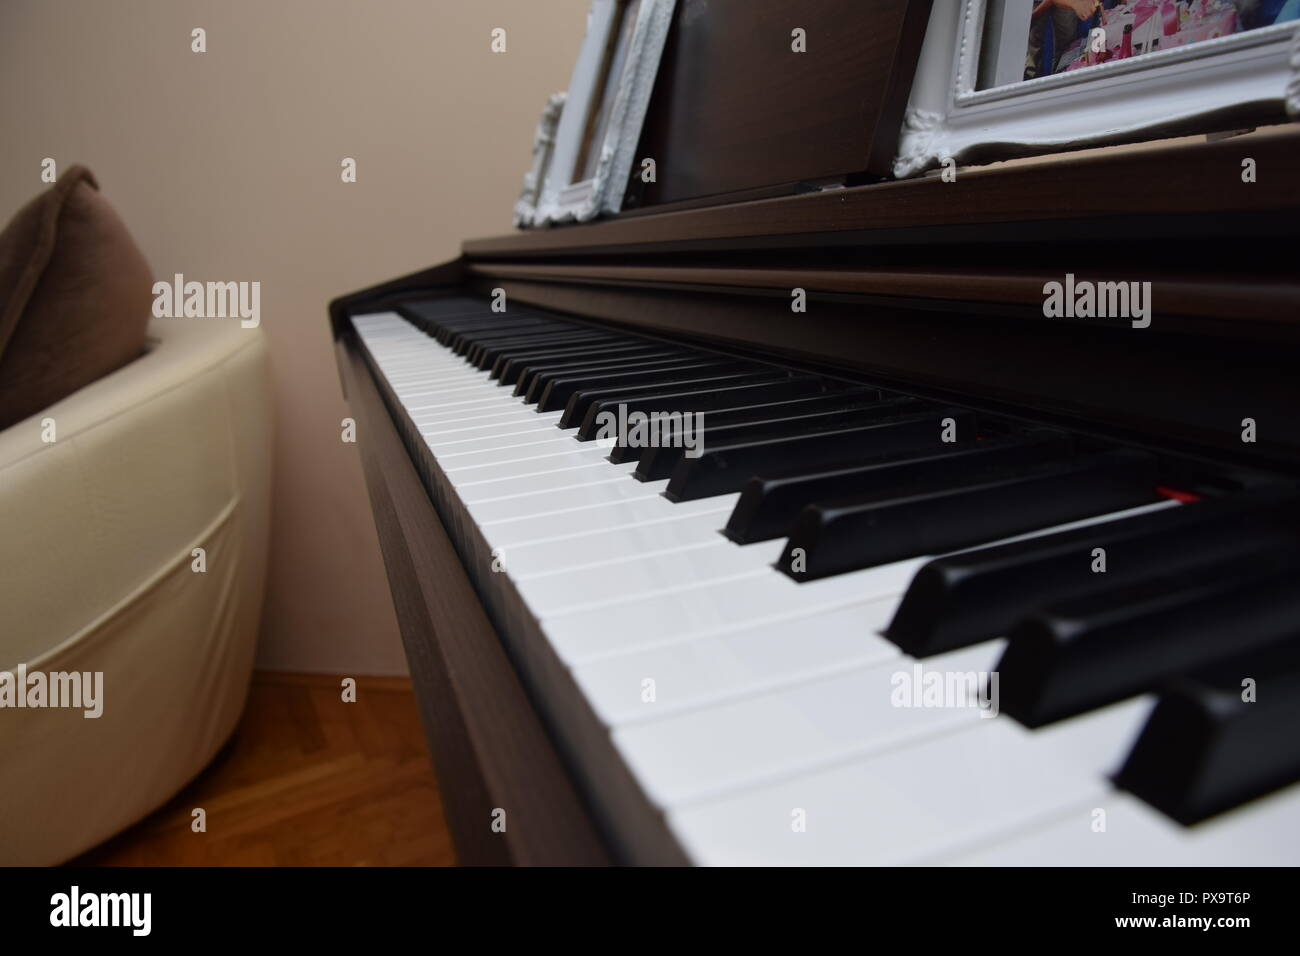 Piano Yamaha - Stock Image